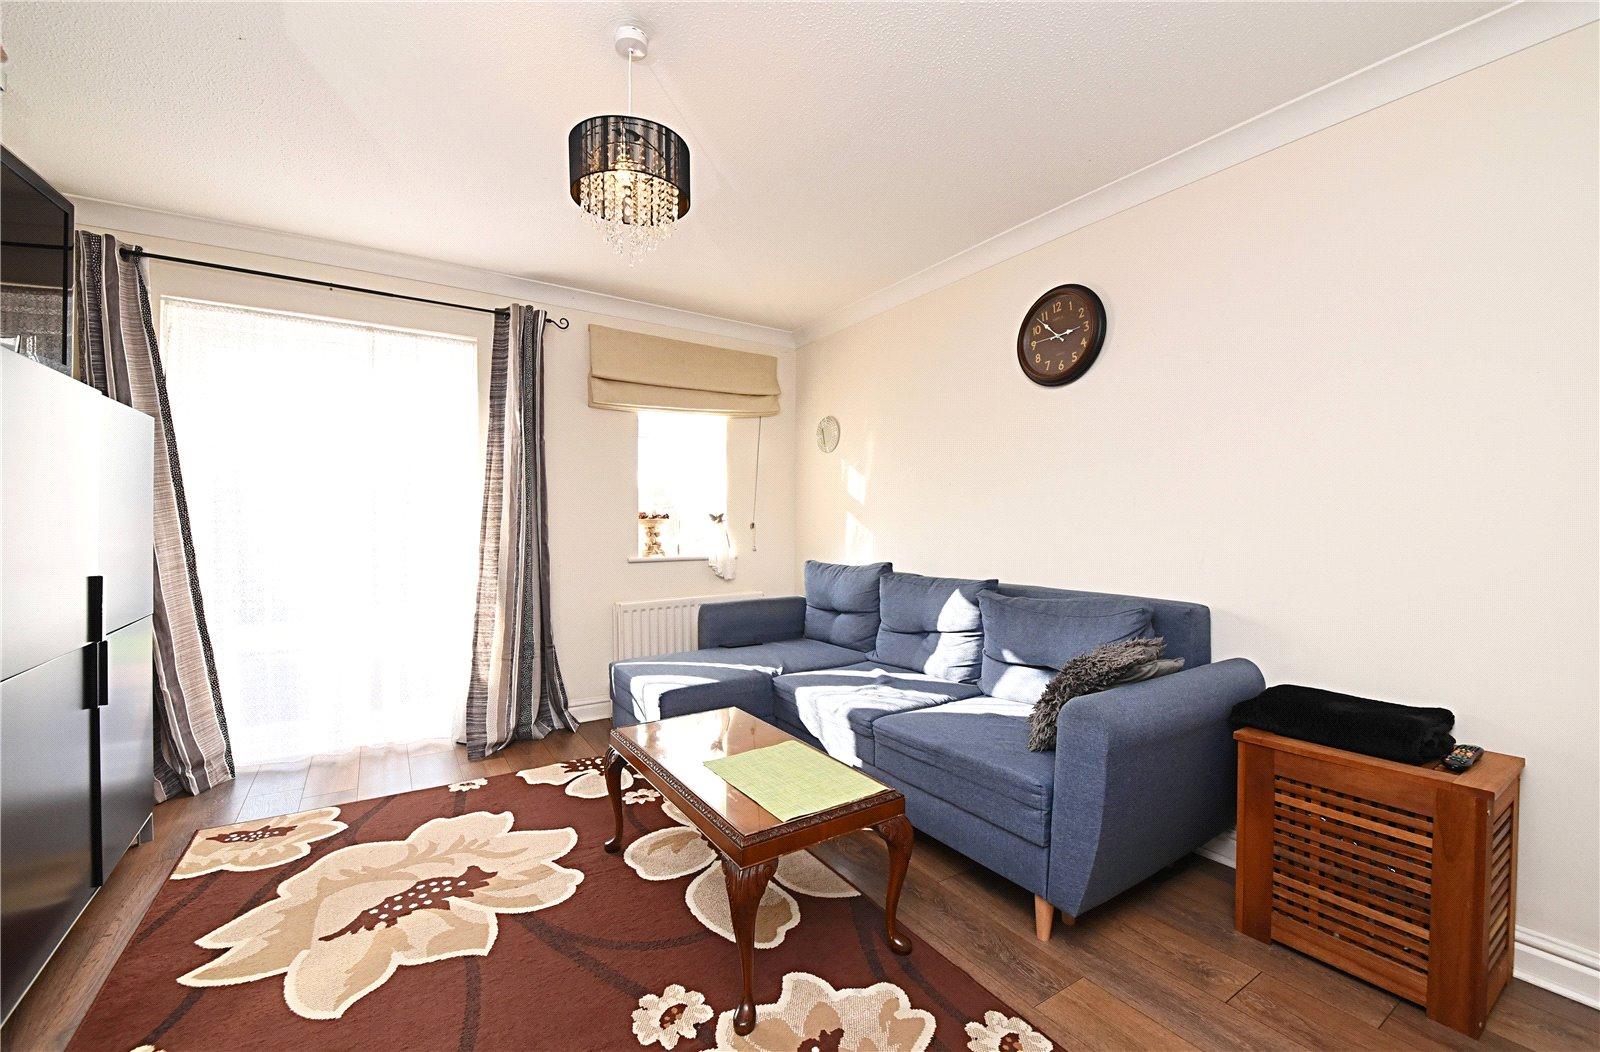 2 bed house to rent in Harrow Weald, HA3 6DA, HA3